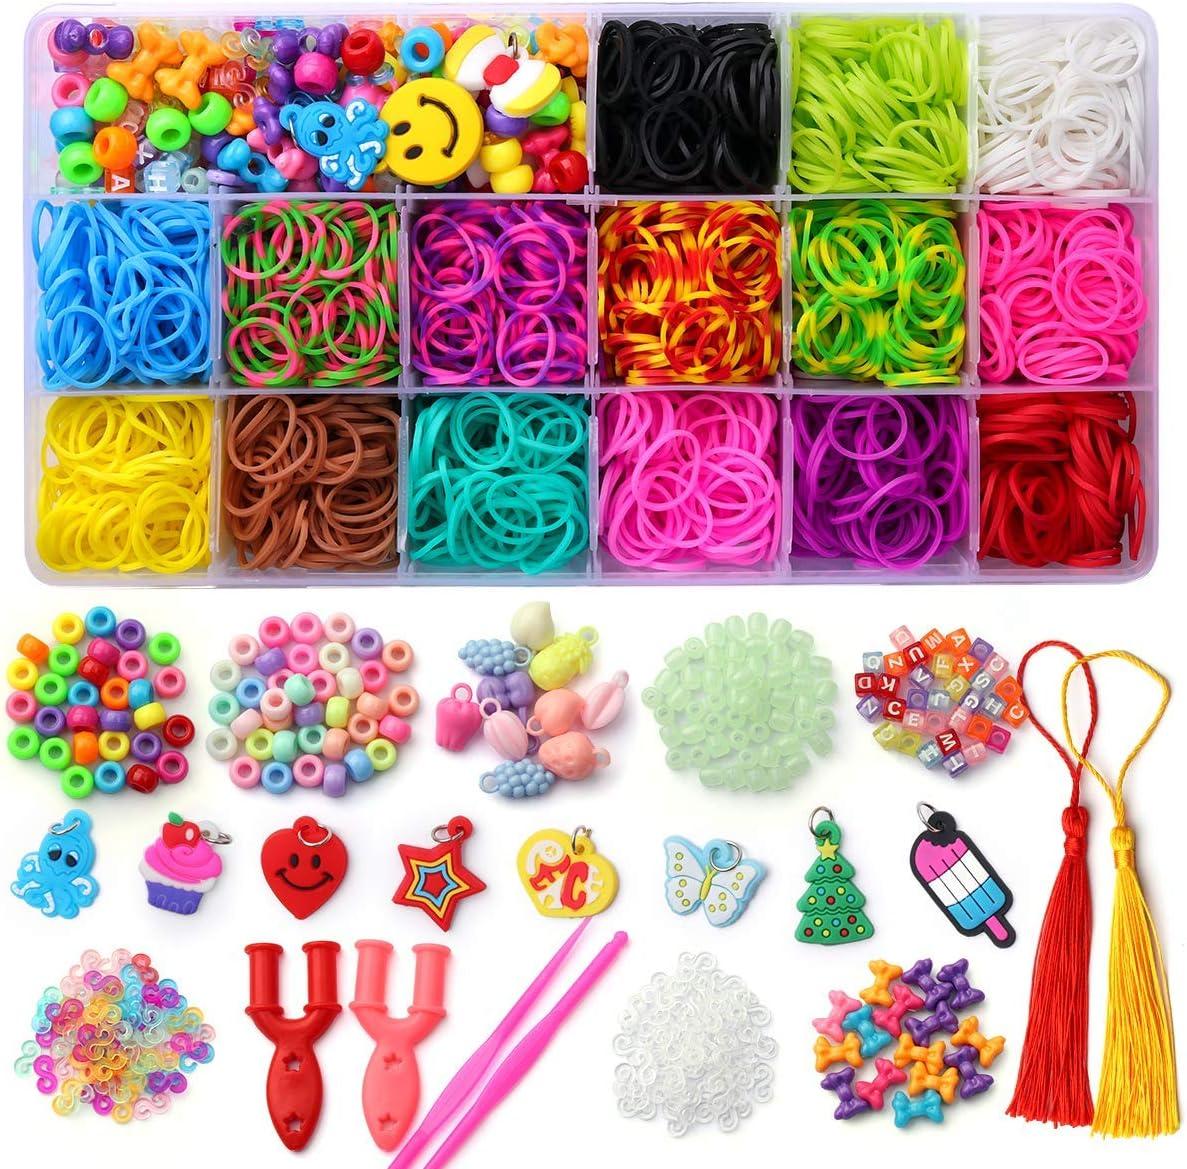 Mocoosy Loom Rubber Bands for Kids Bracelet Making Kit, Over 2200 Colored Loom Bands Refill Set, DIY Rainbow Rubber Bands Crafts for Girls Boys Great Gifts…: Furniture & Decor